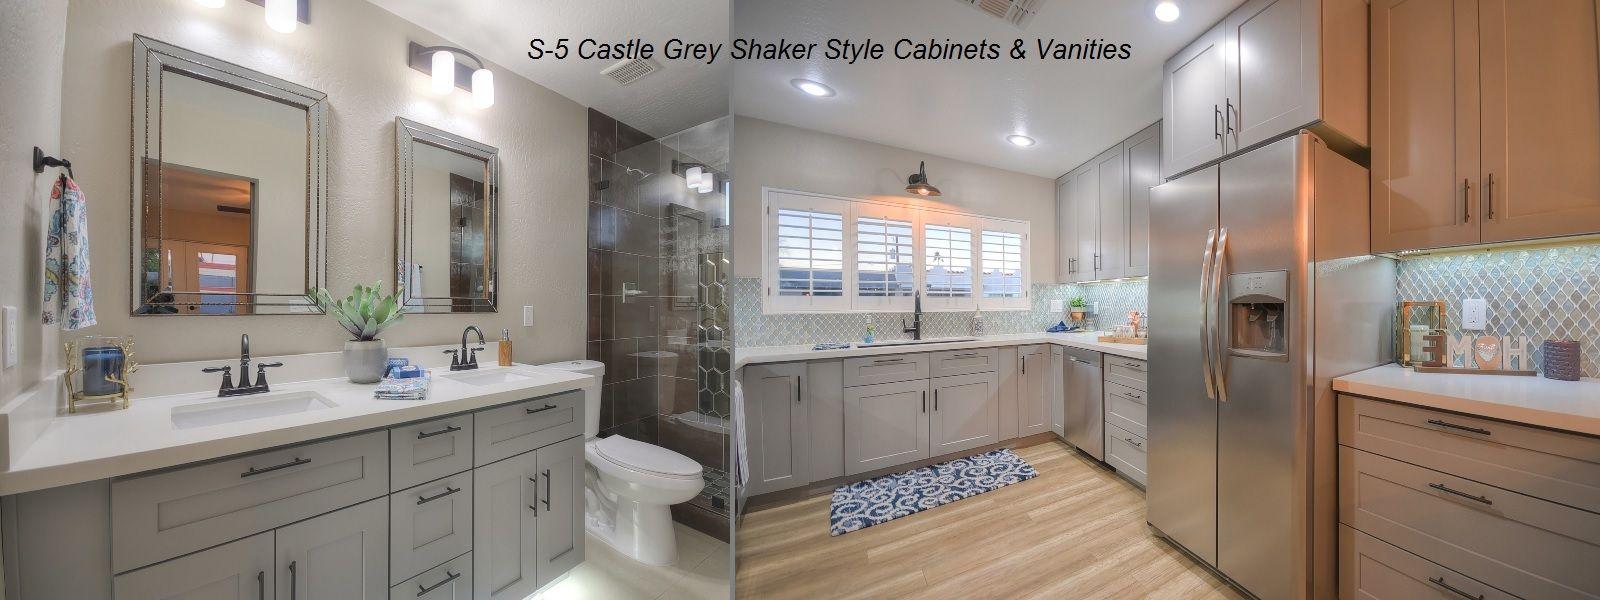 J K Cabinetry Az Wholesale Grey Shaker Kitchen Cabinets Vanities Black Kitchen Faucets Pull Out Kitchen Faucet Delta Faucets